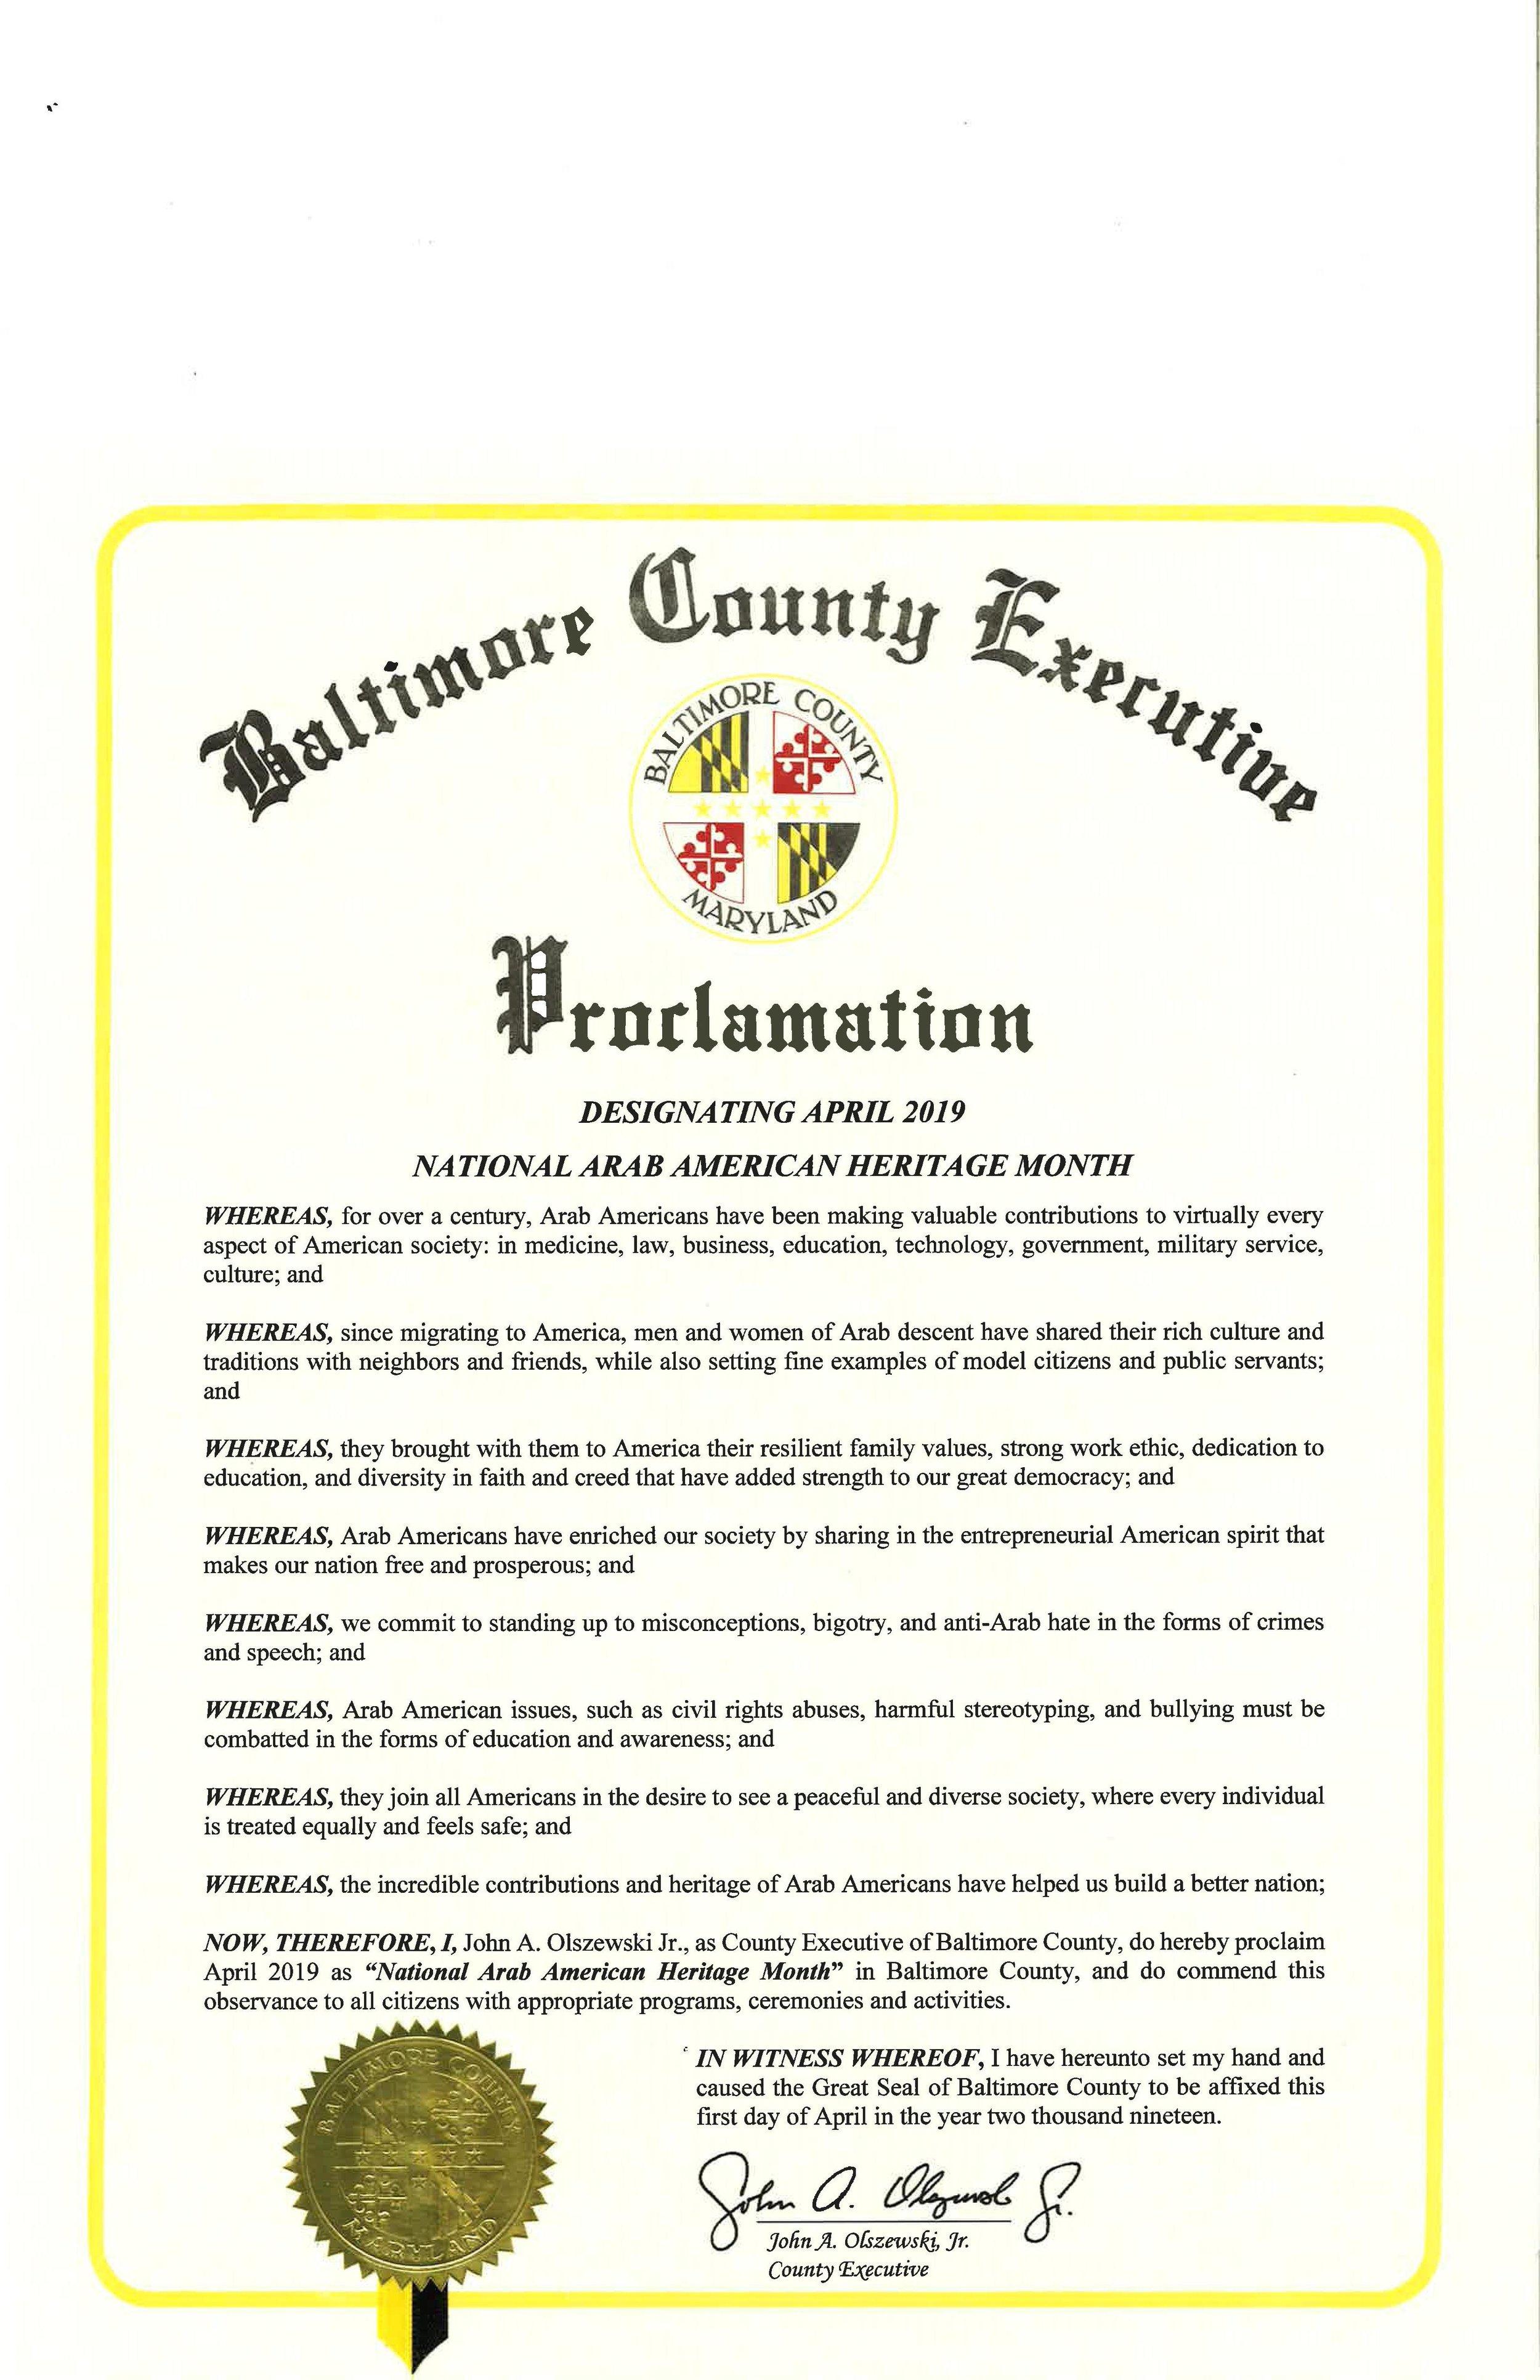 Baltimore County Proclamation_1.jpg